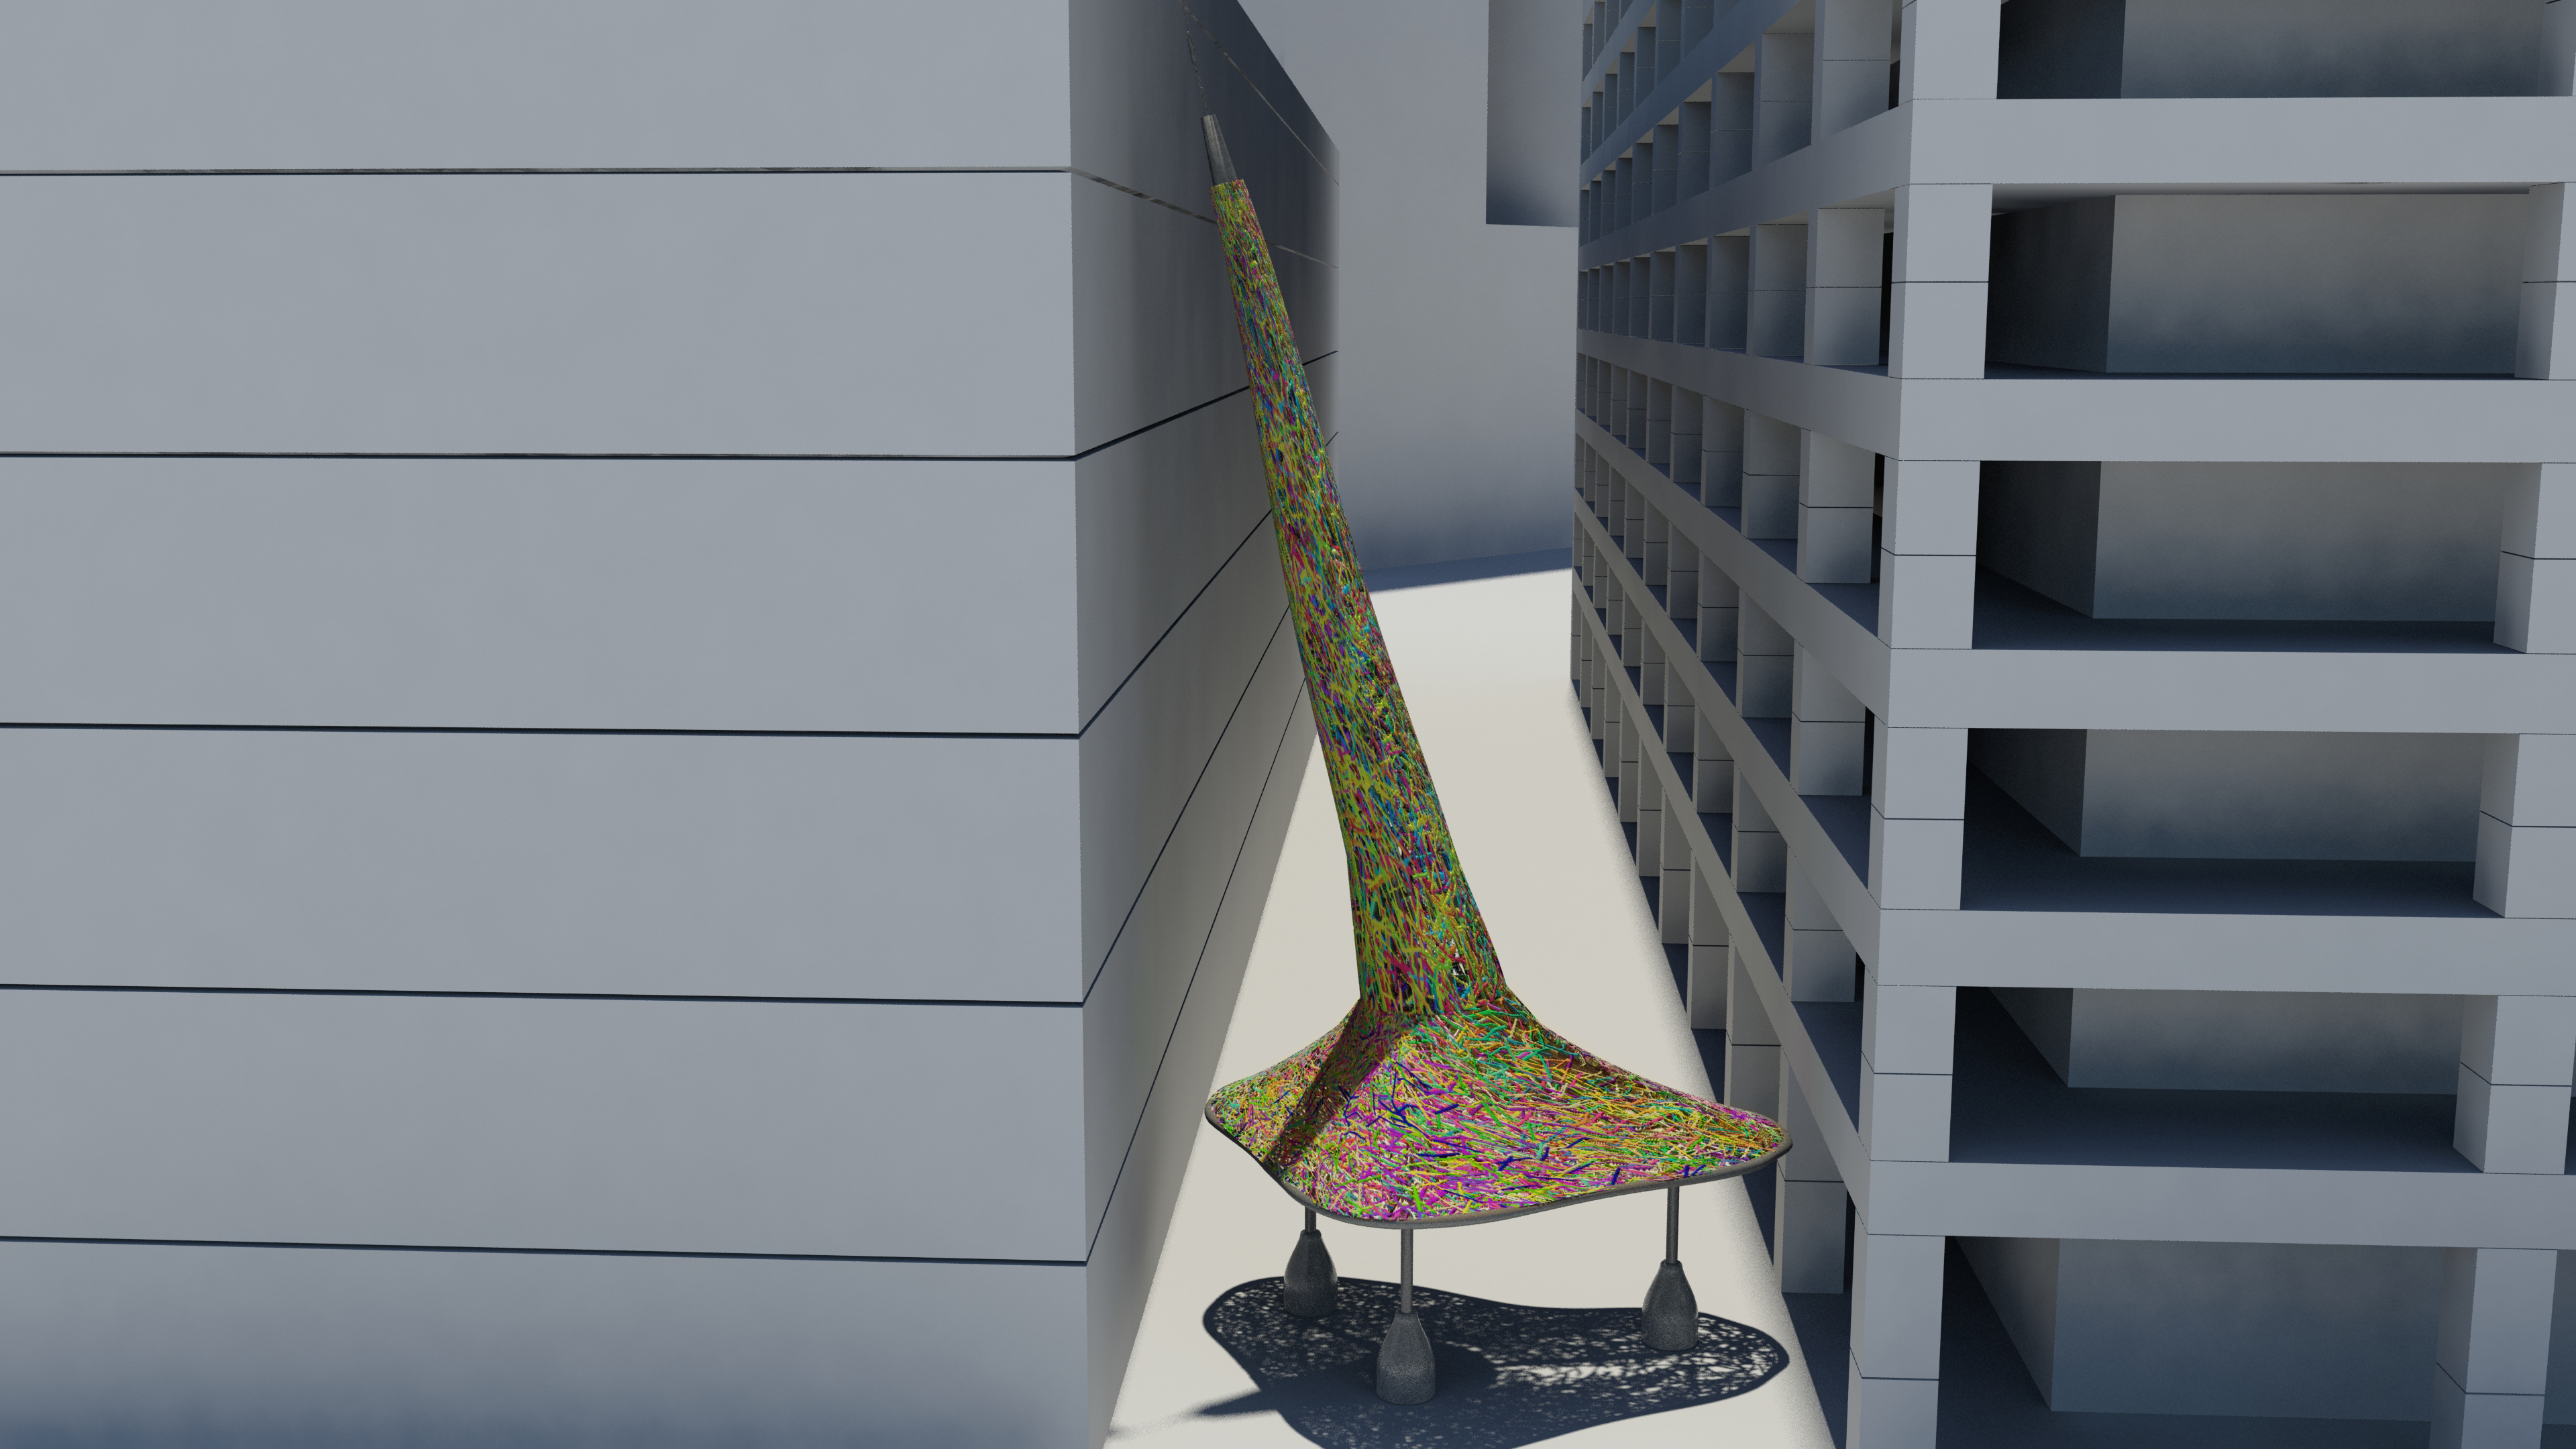 Trumpet Flower art blocks